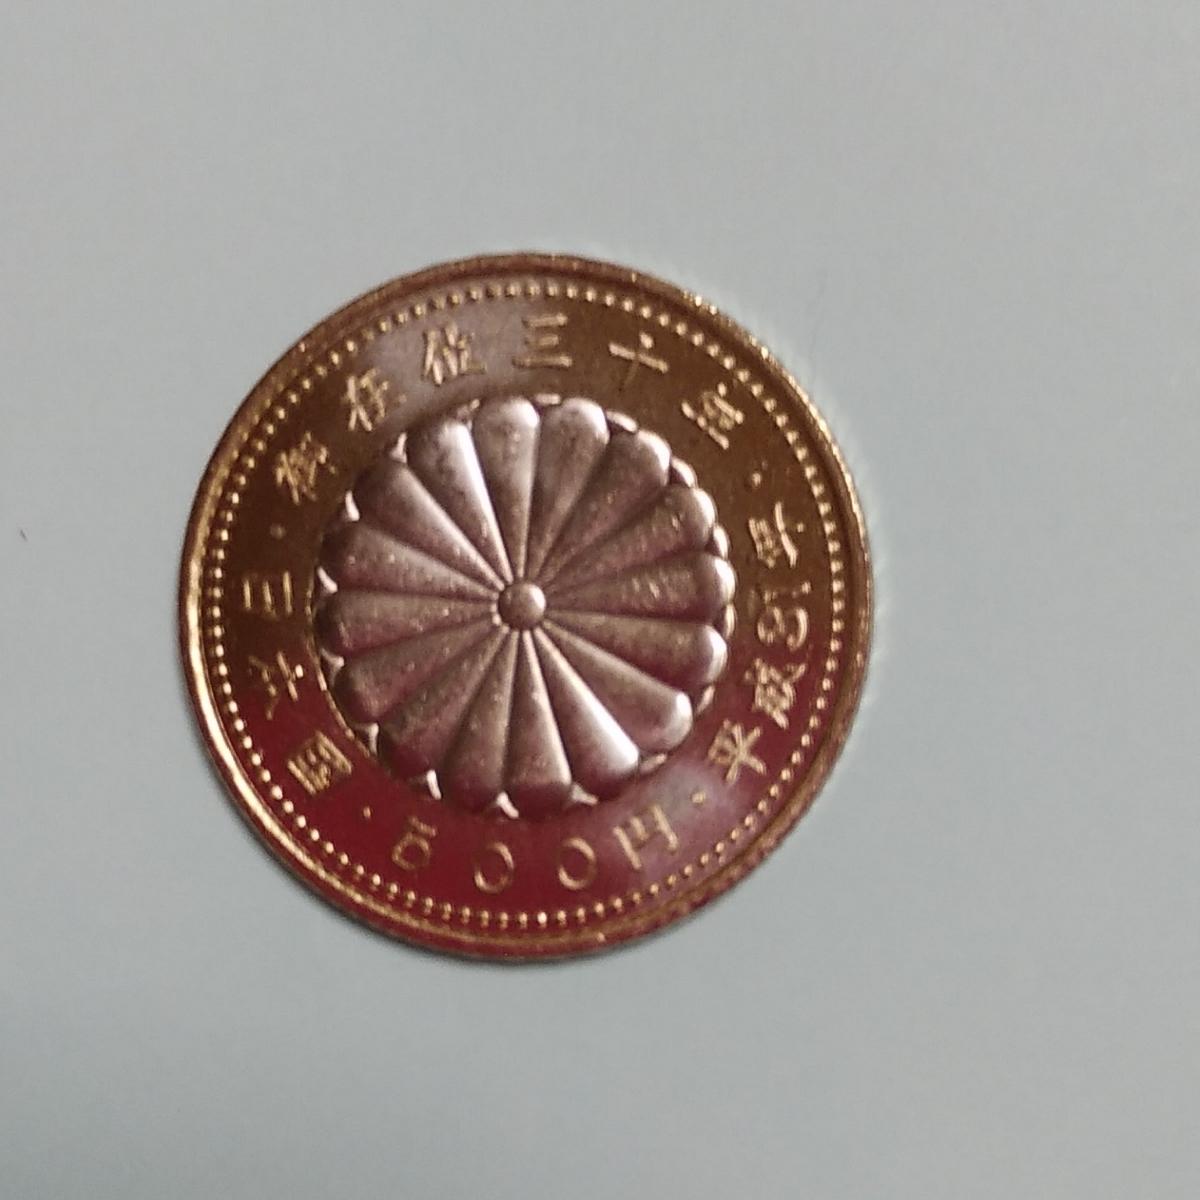 円 平成 31 年 玉 500 の